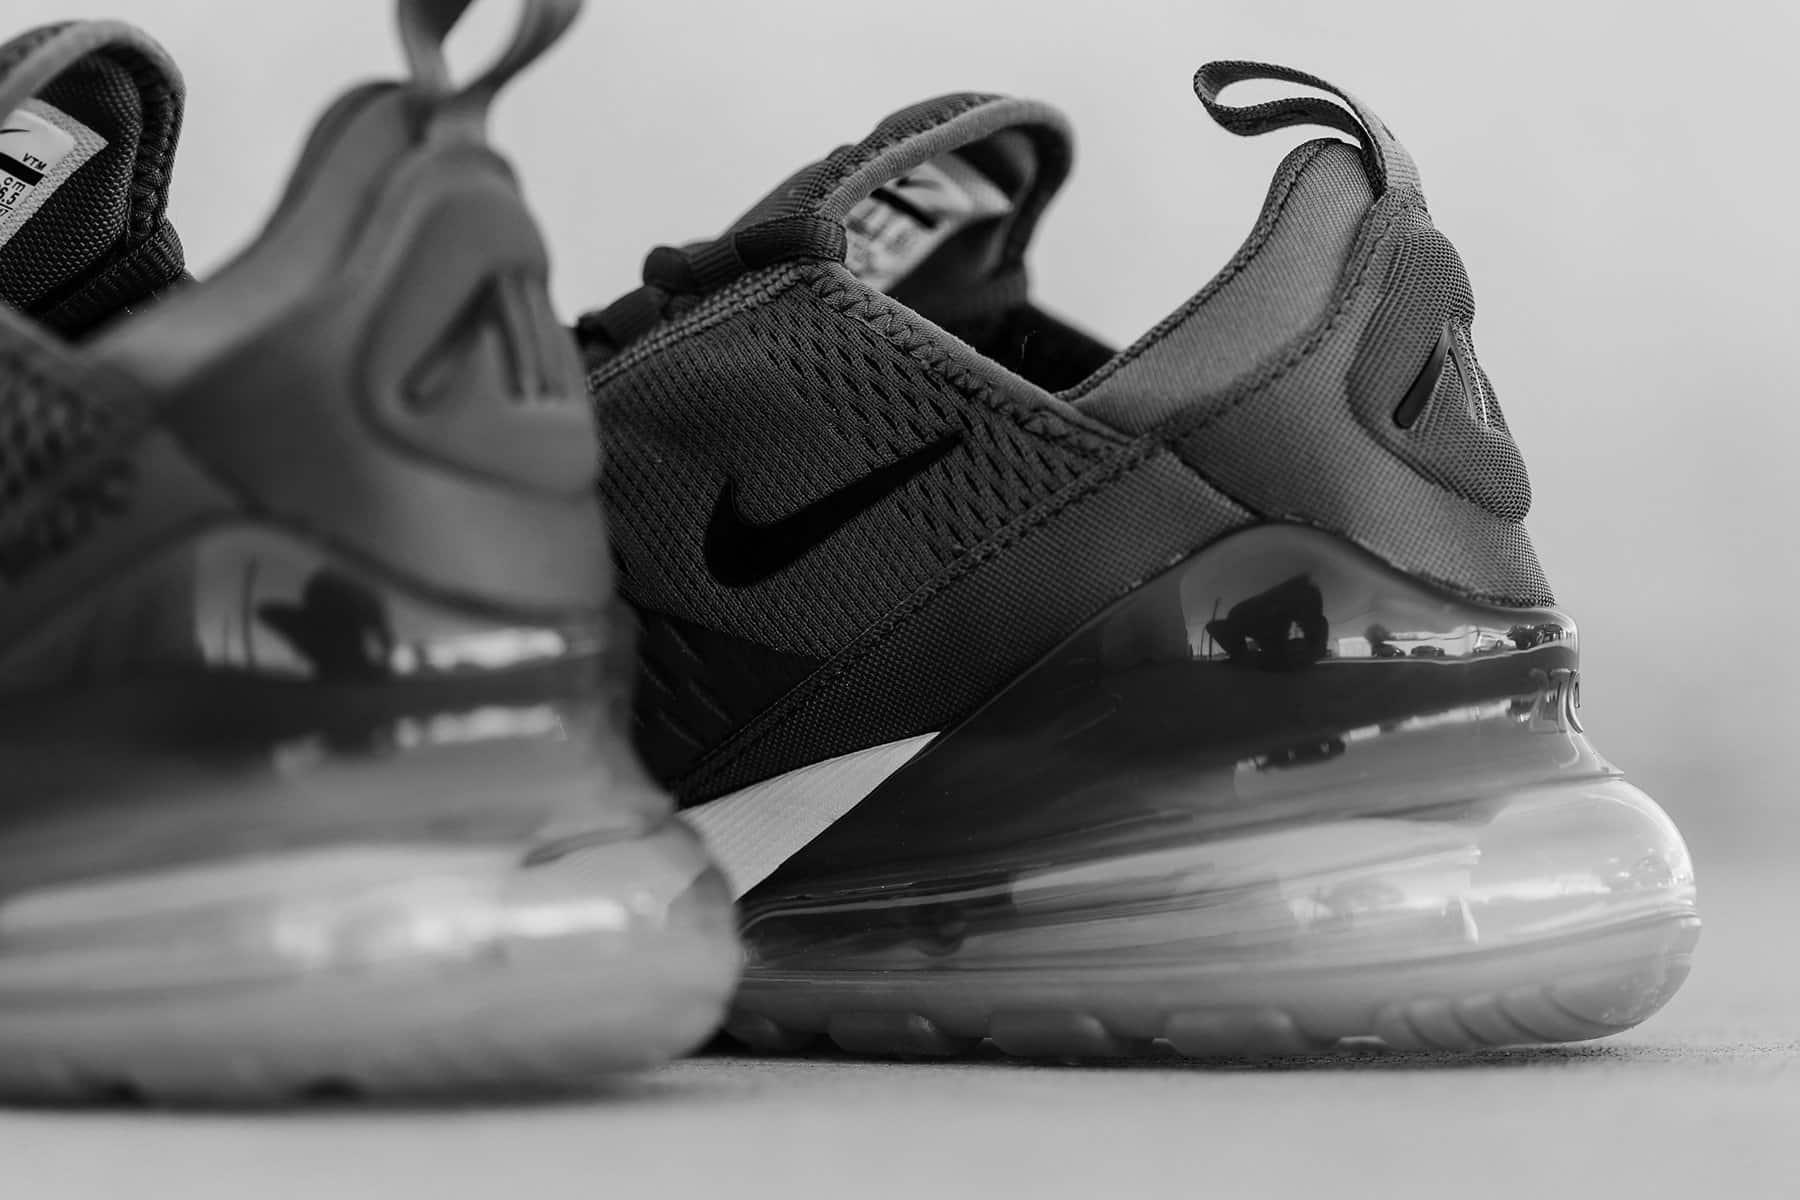 3ac98ee6d15 Baskets Nike Air Max 270   les derniers articles - Sneaker Style